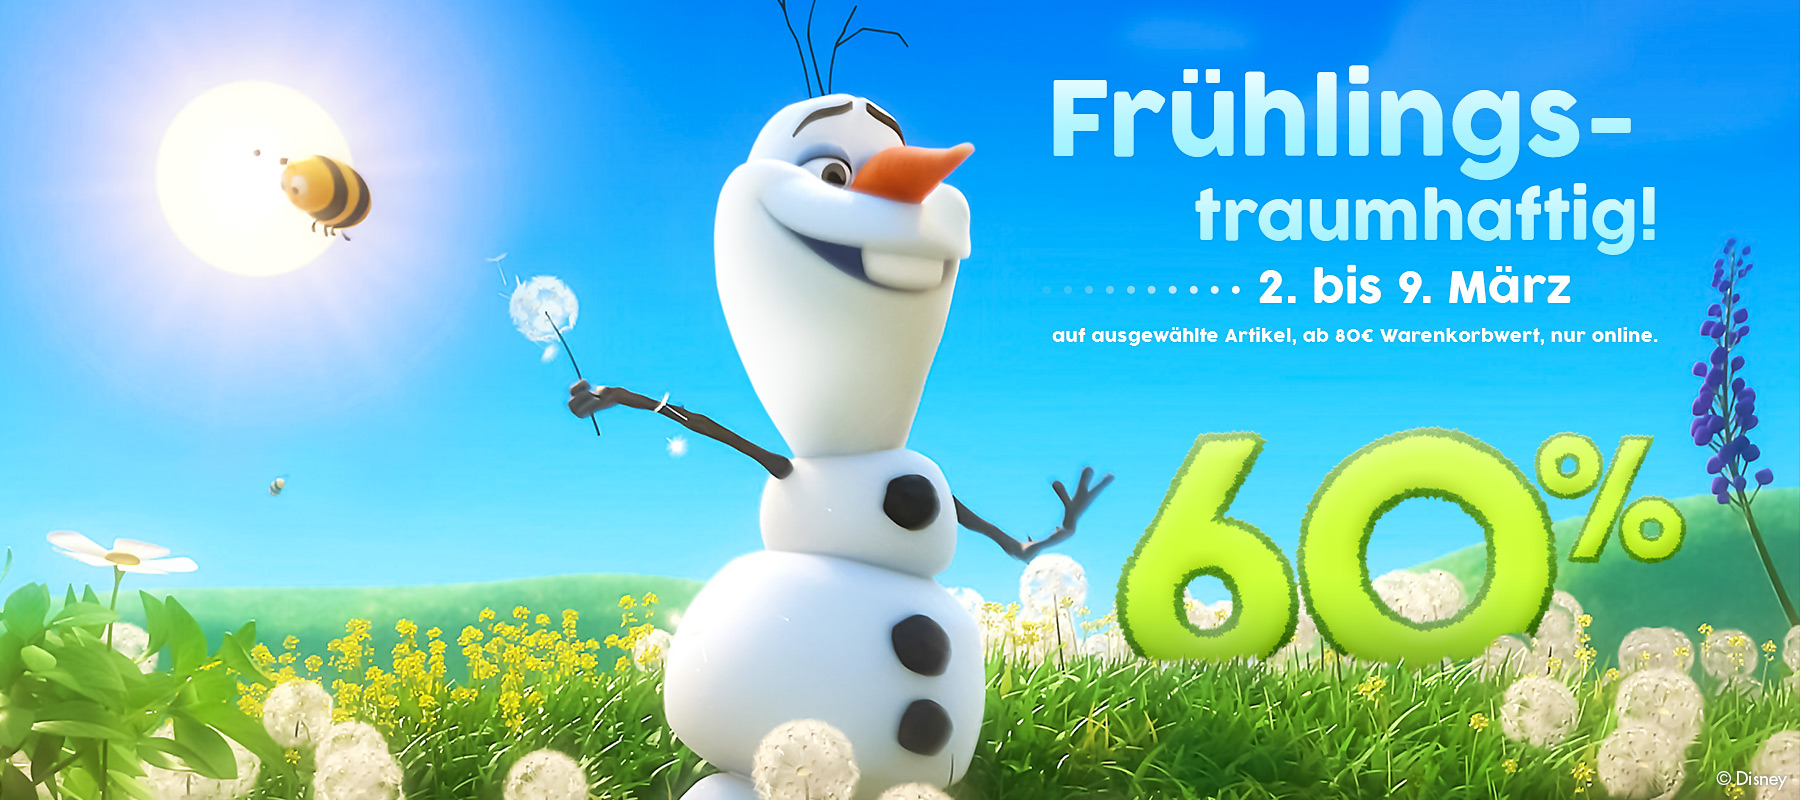 60% Frühlingstraum-Aktion